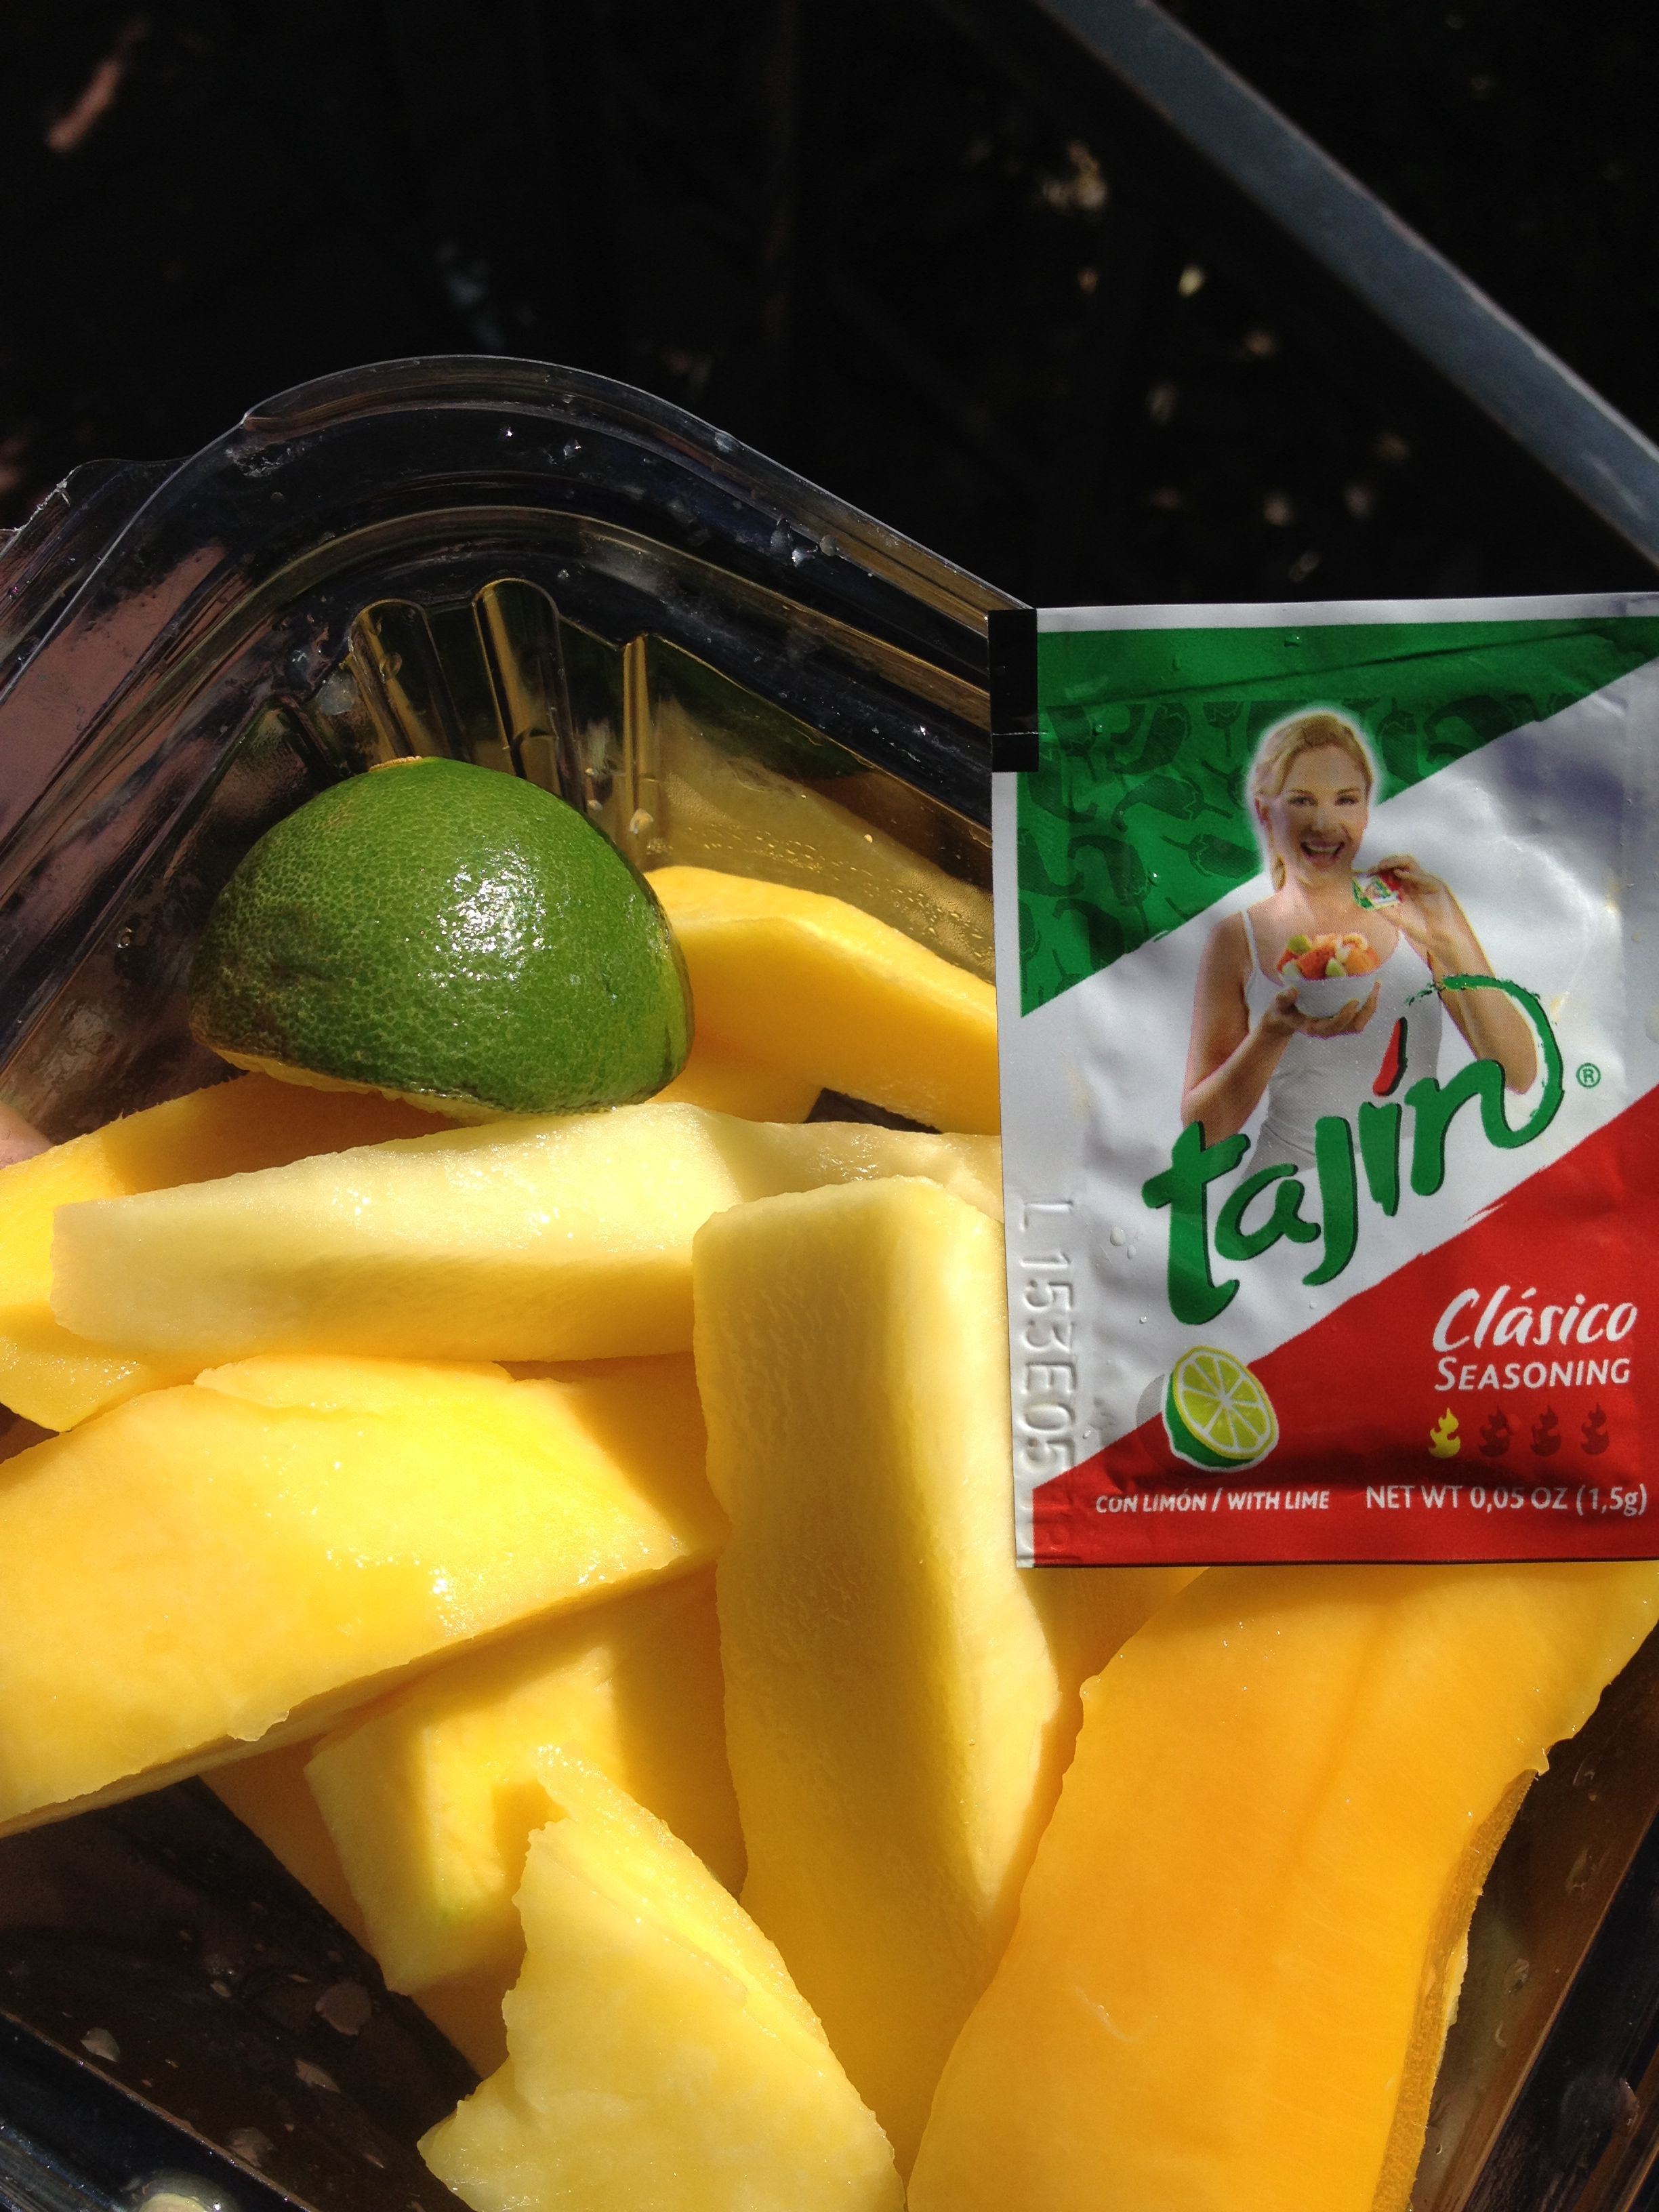 Healthy Snack At Disneyland Mangos Lime And This Amazing Spice Packet Delish Tajin Seasoning Healthy Snack Options Healthy Snacks Tajin Recipes